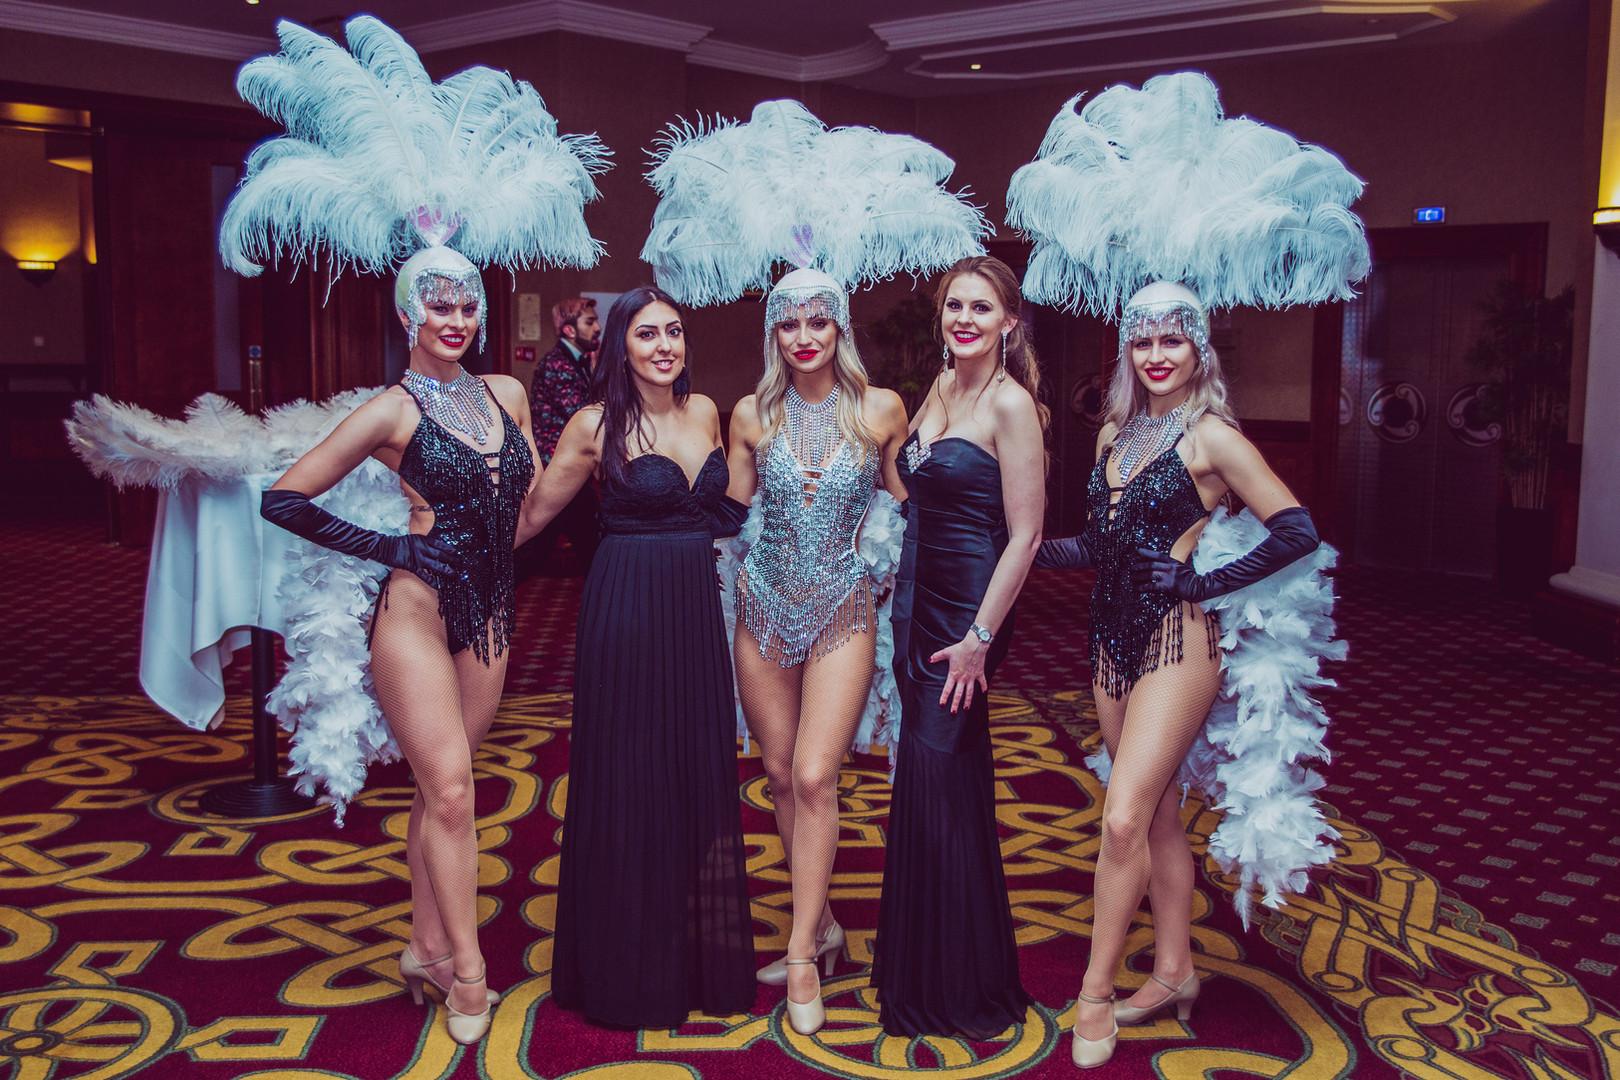 Showgirls at the Celtic Manor Resort